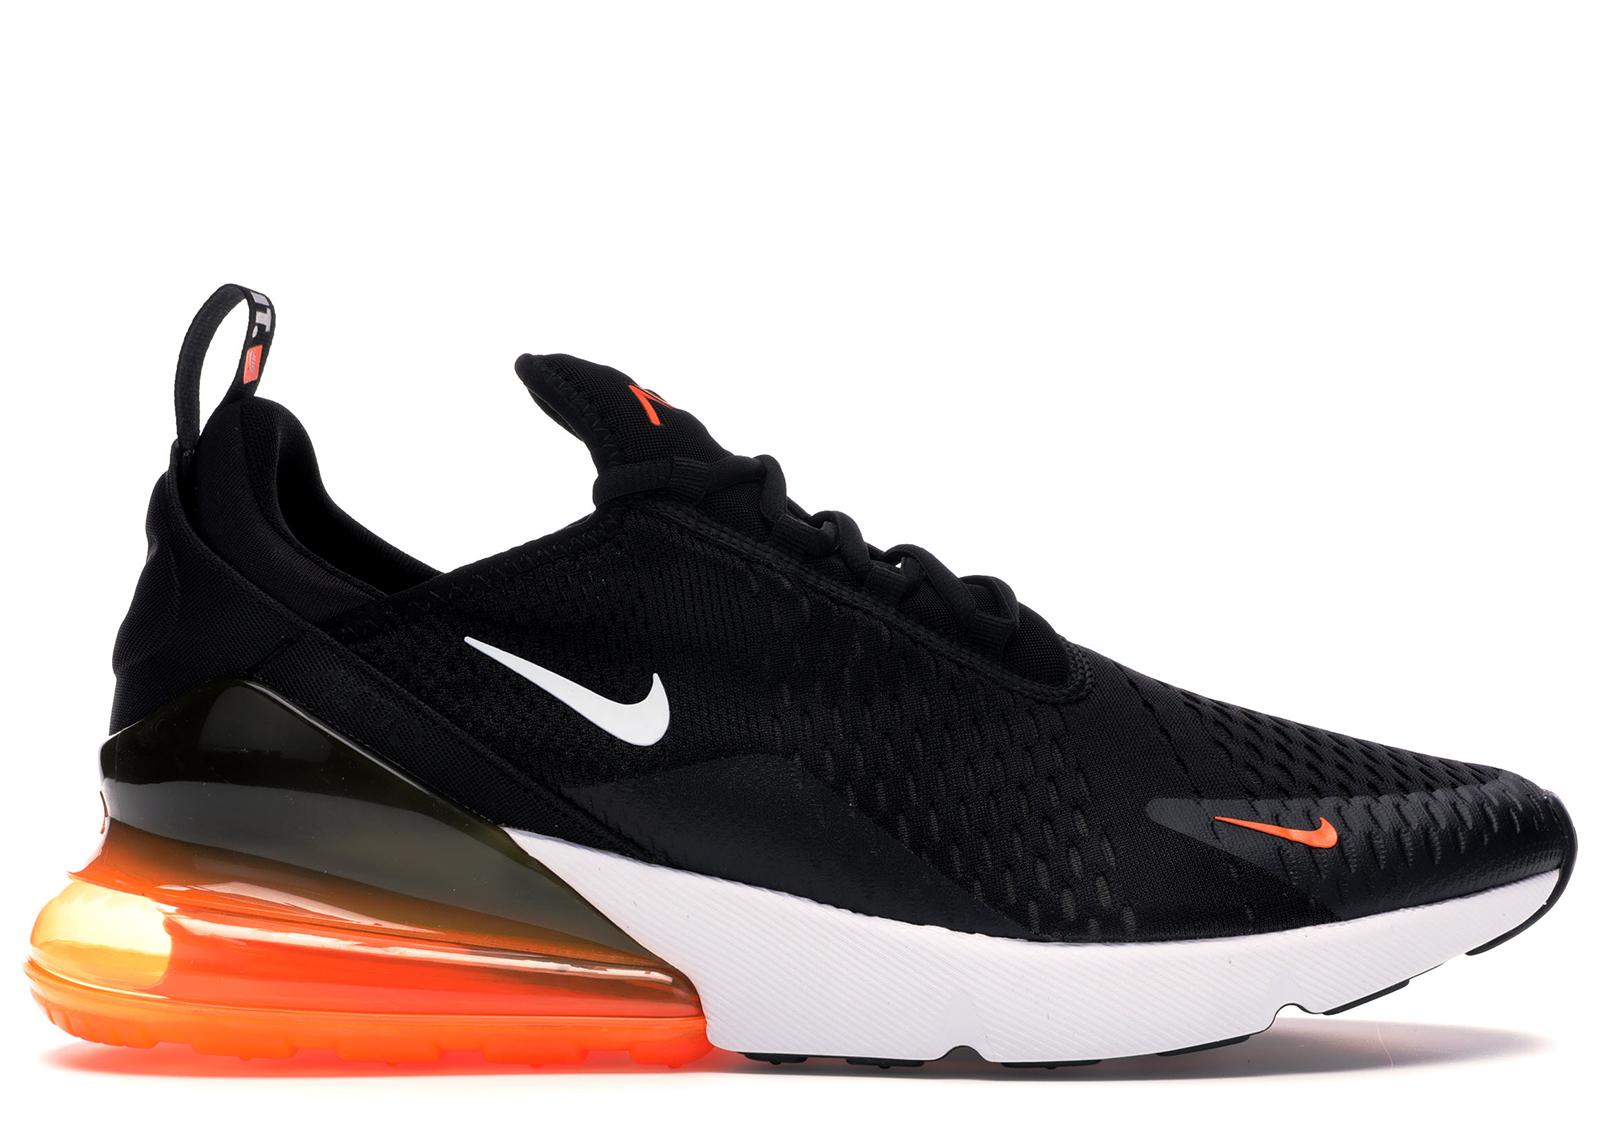 Nike Air Max 270 Black White Total Orange